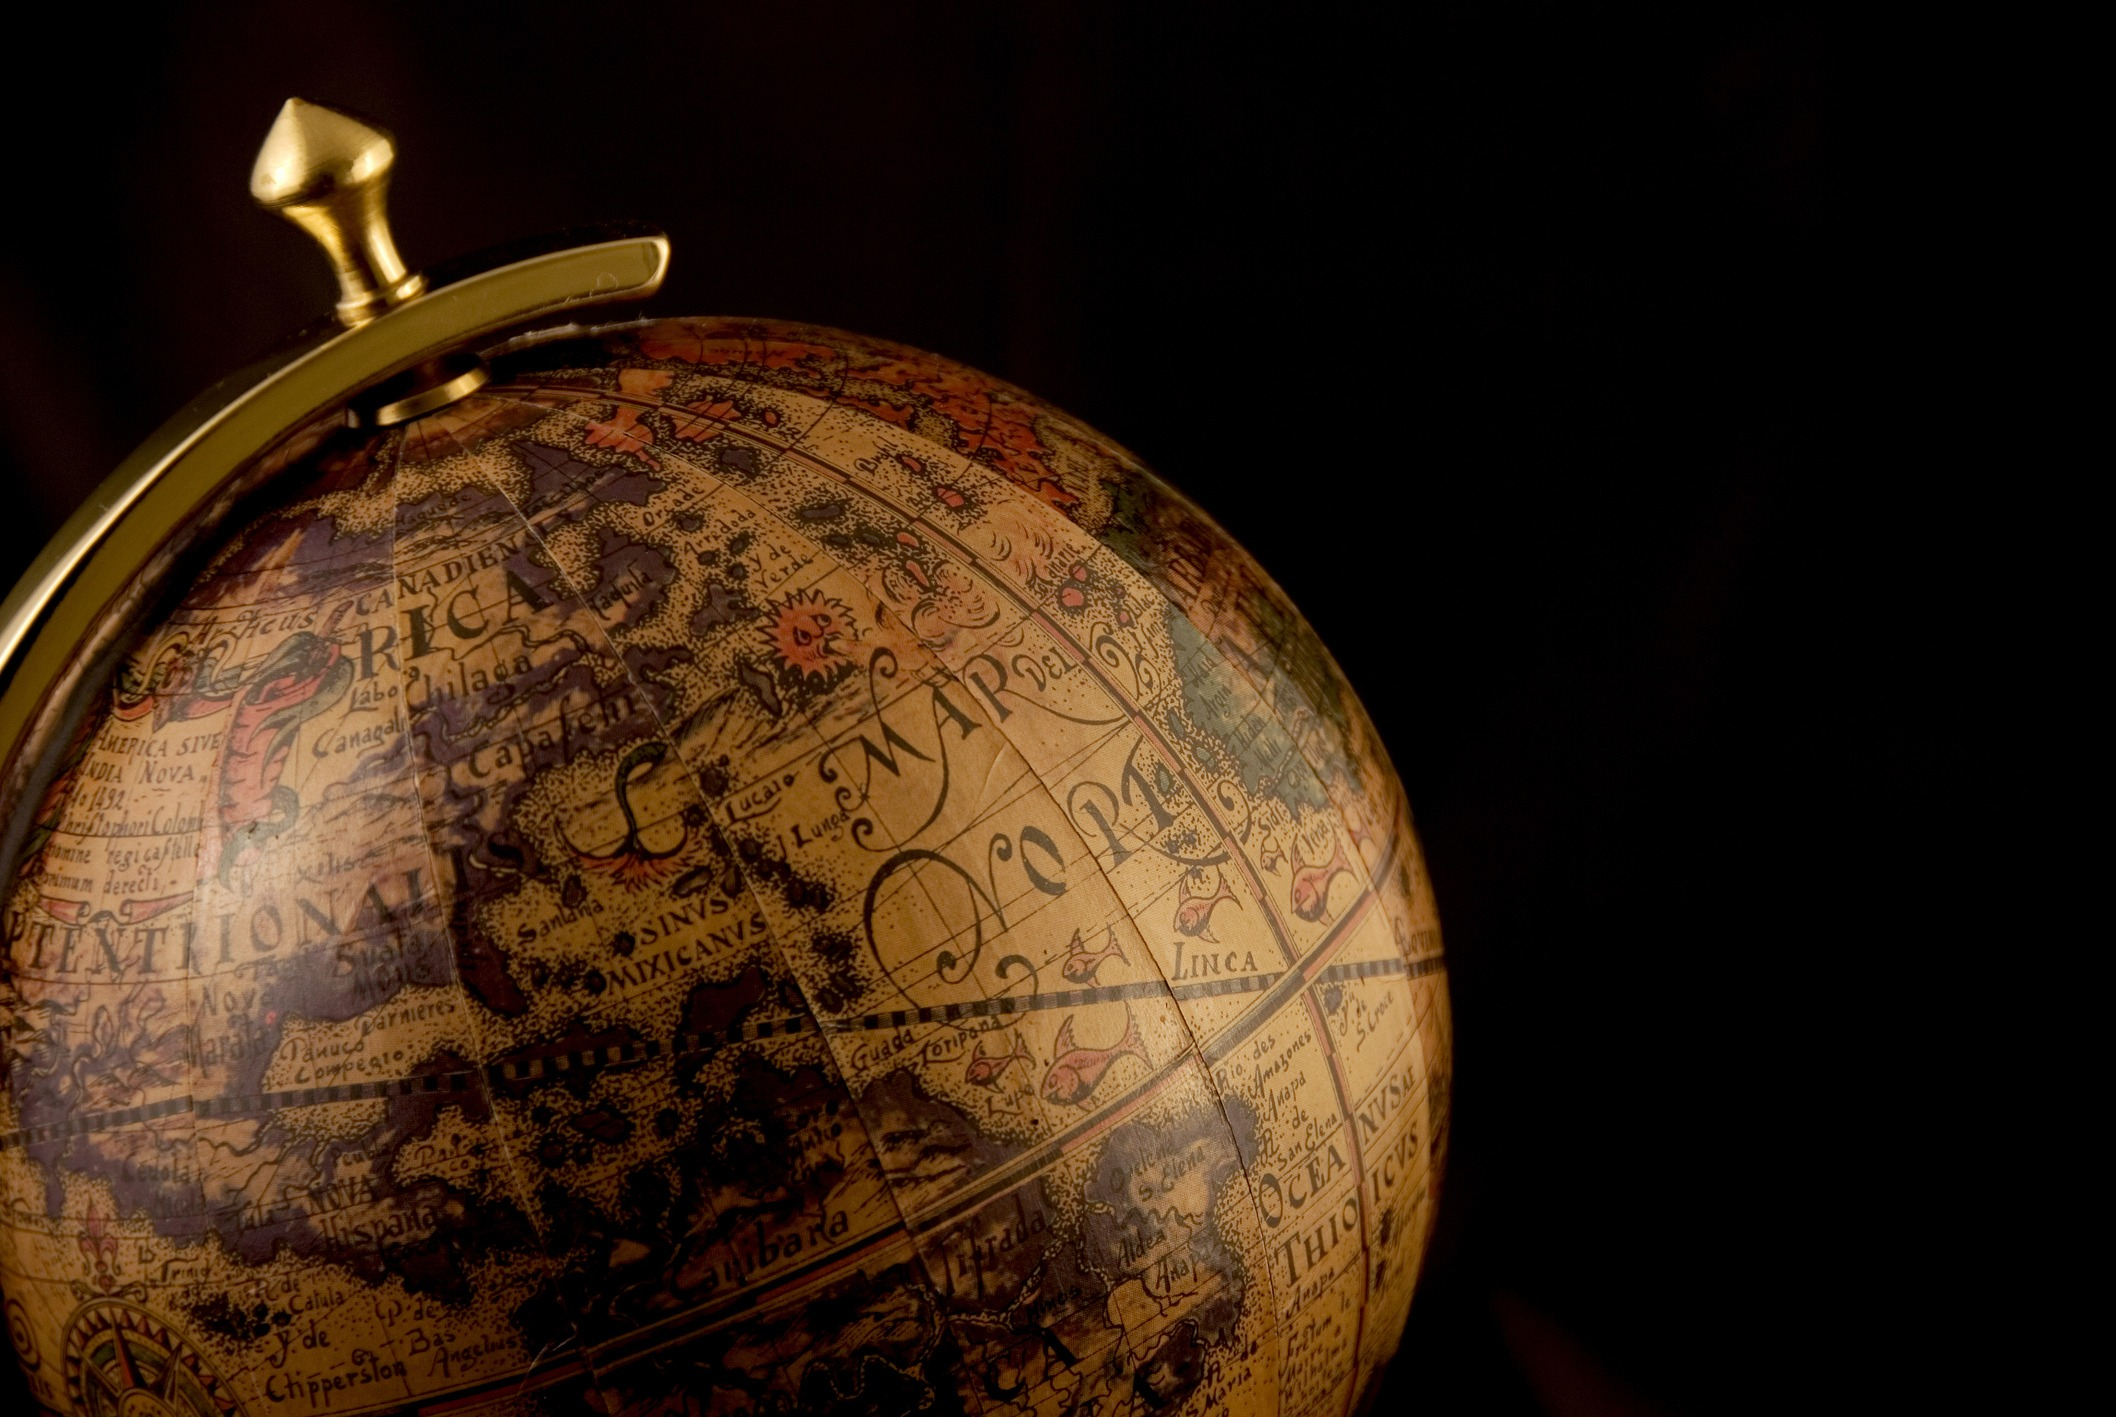 Antique globe